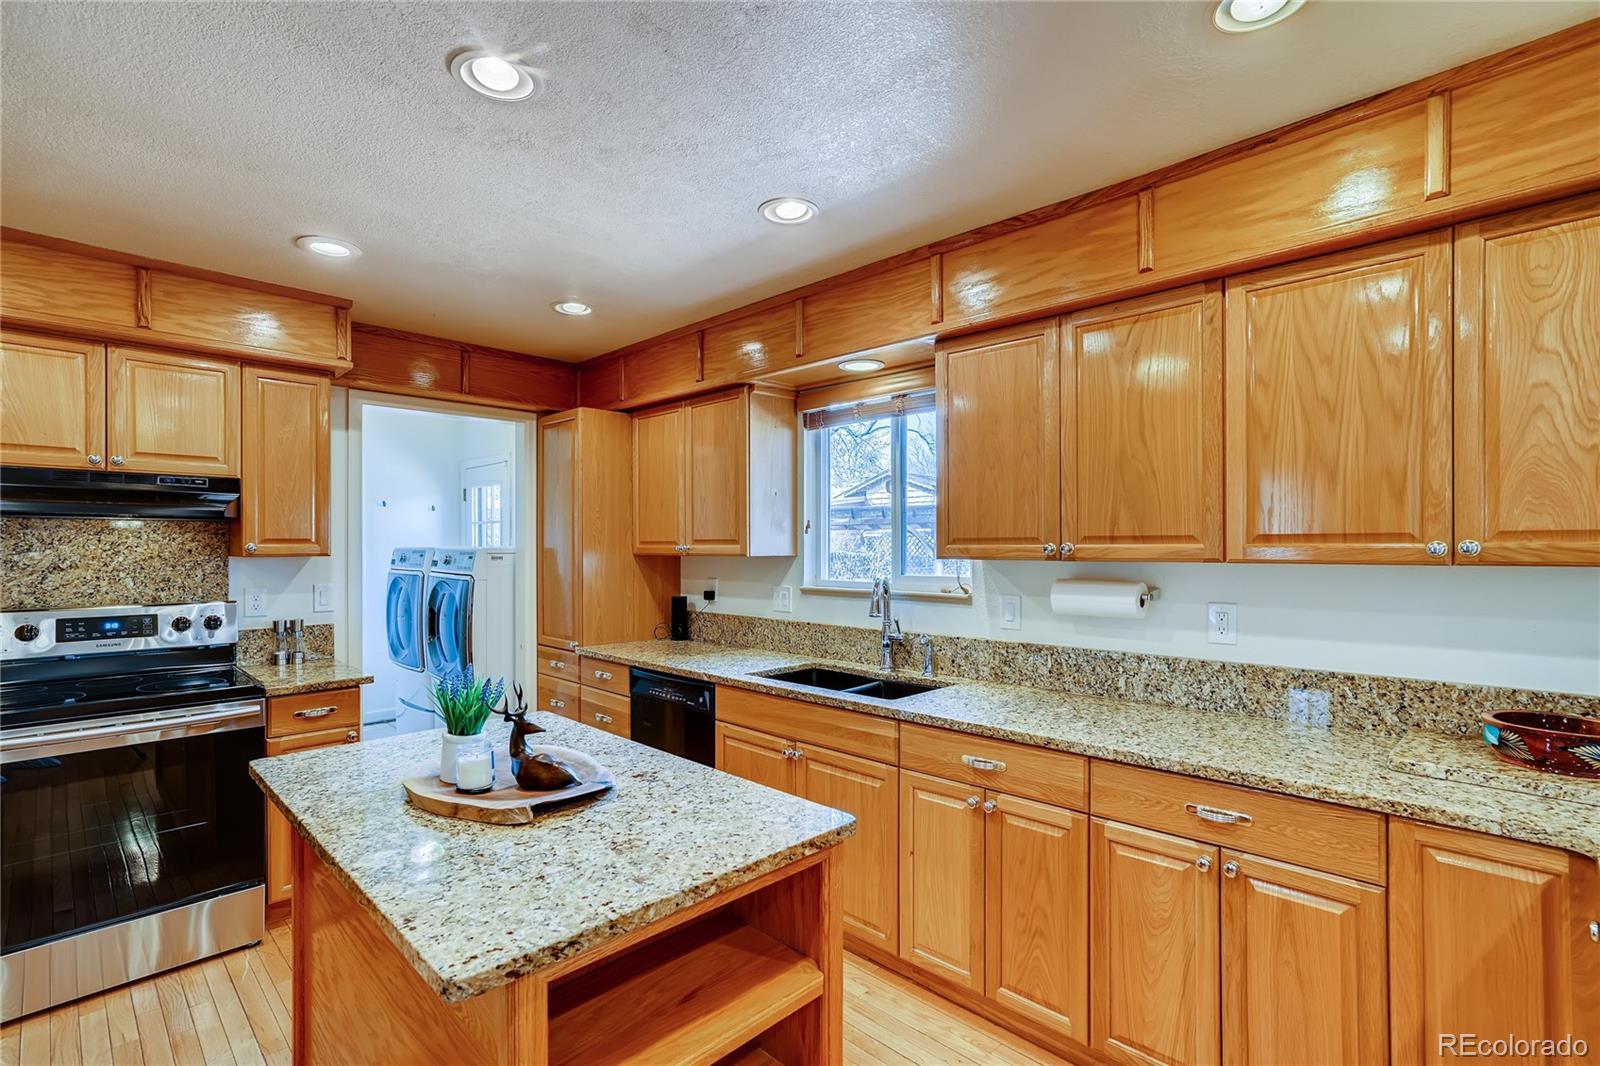 MLS# 9748380 - 8 - 8897 W Woodard Drive, Lakewood, CO 80227